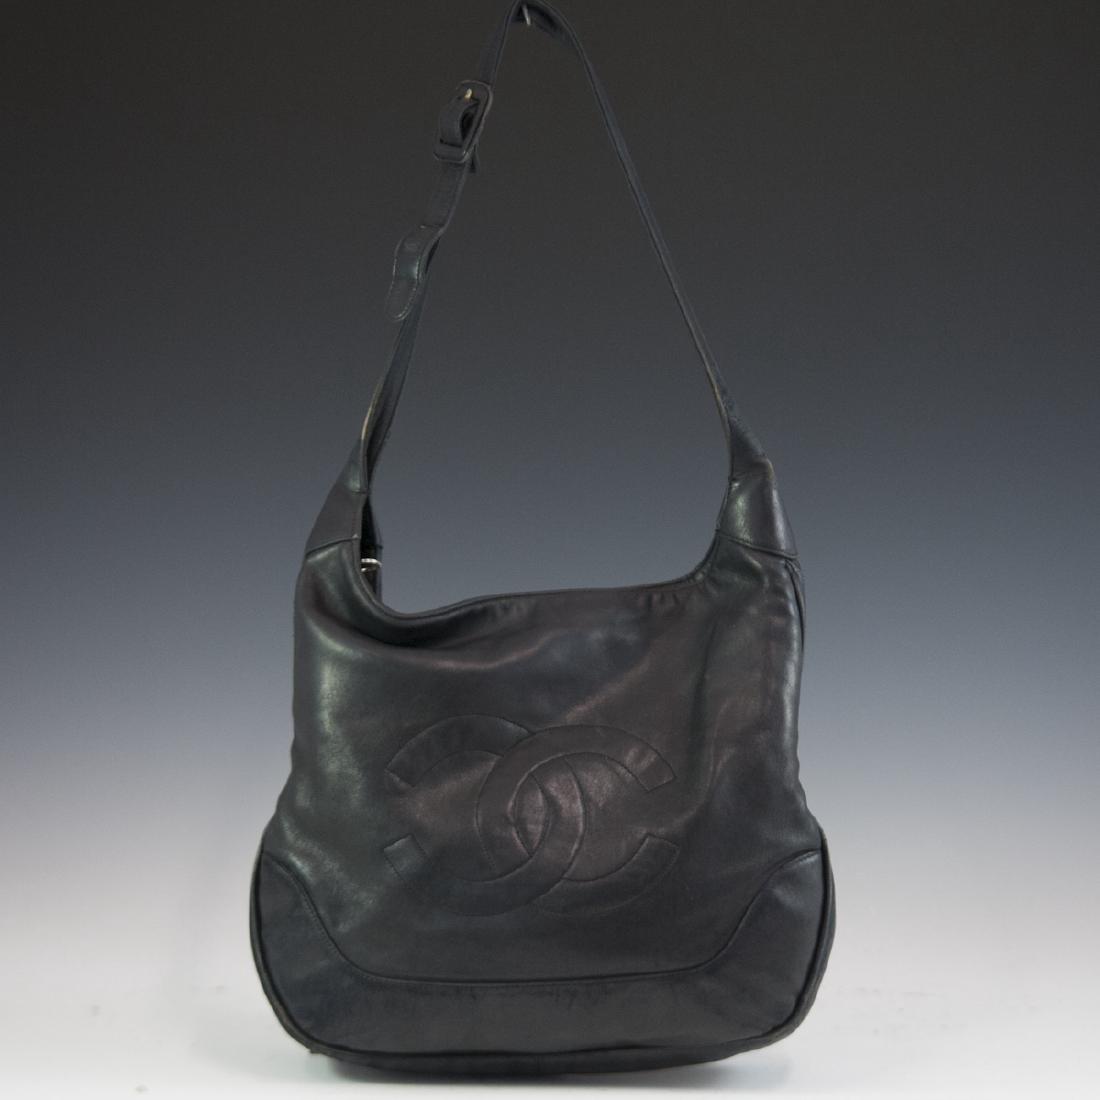 Chanel Black Leather Purse